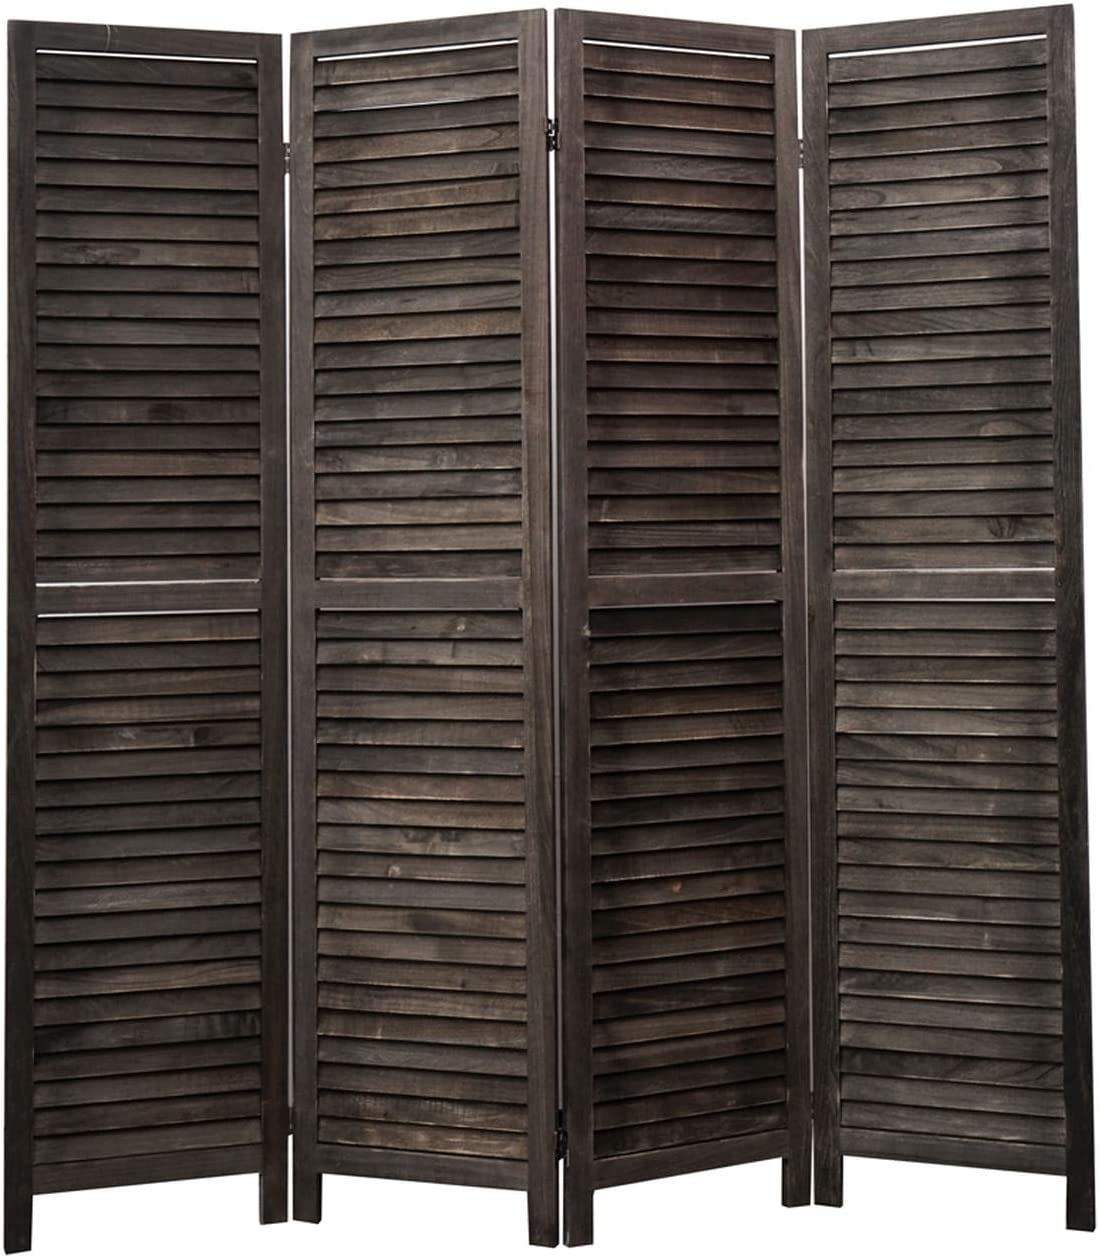 Legacy Decor 4 Panel Room Divider Full Length Wood Shutters Louver Black